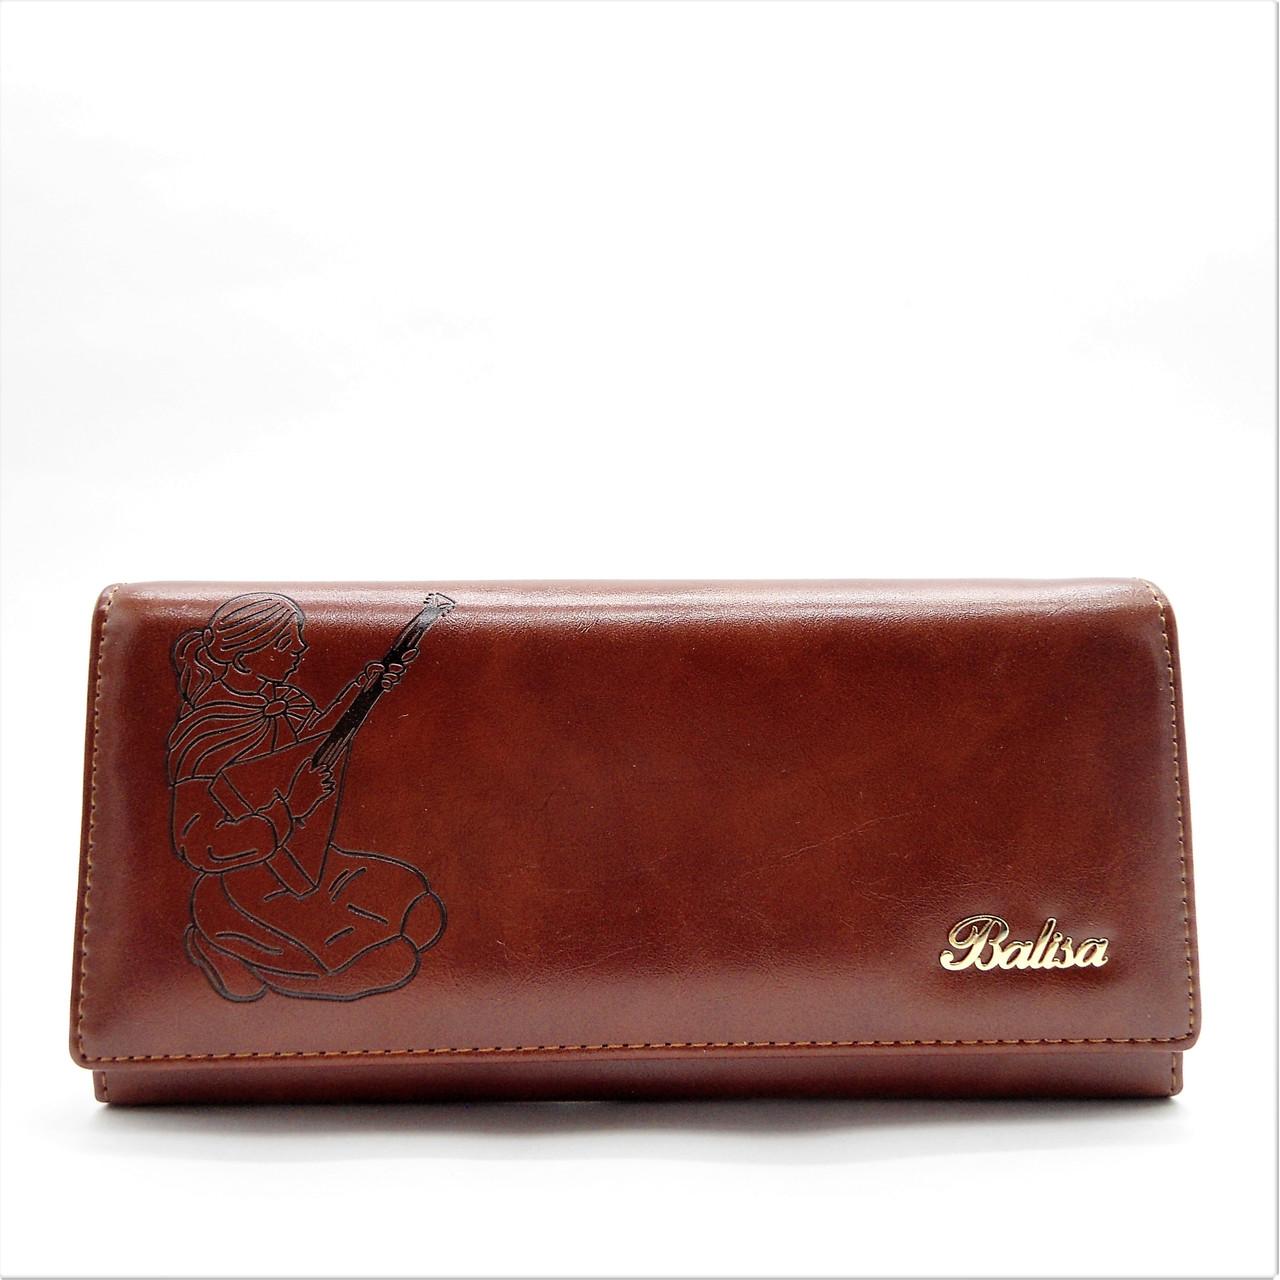 Женский кошелек BАLISА коричневого цвета с девушкой WPP-054403, фото 1